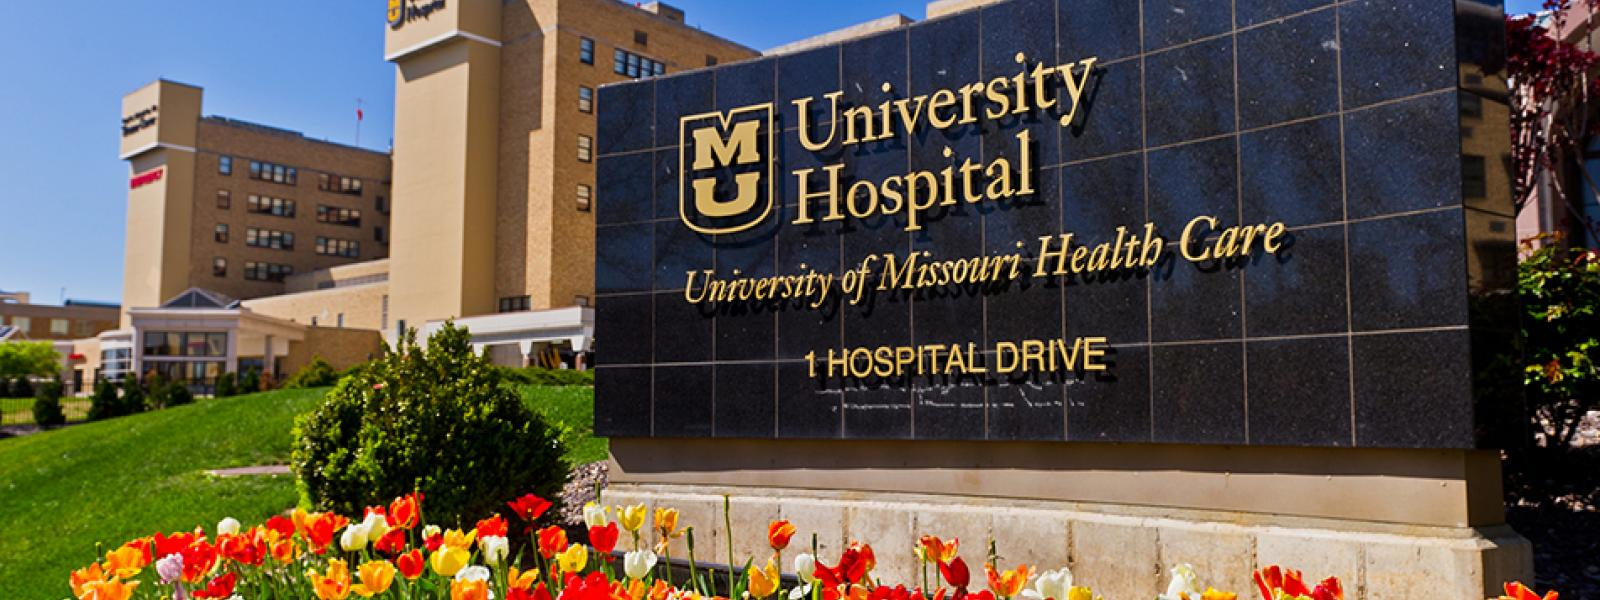 University Hospital - MU Health Care